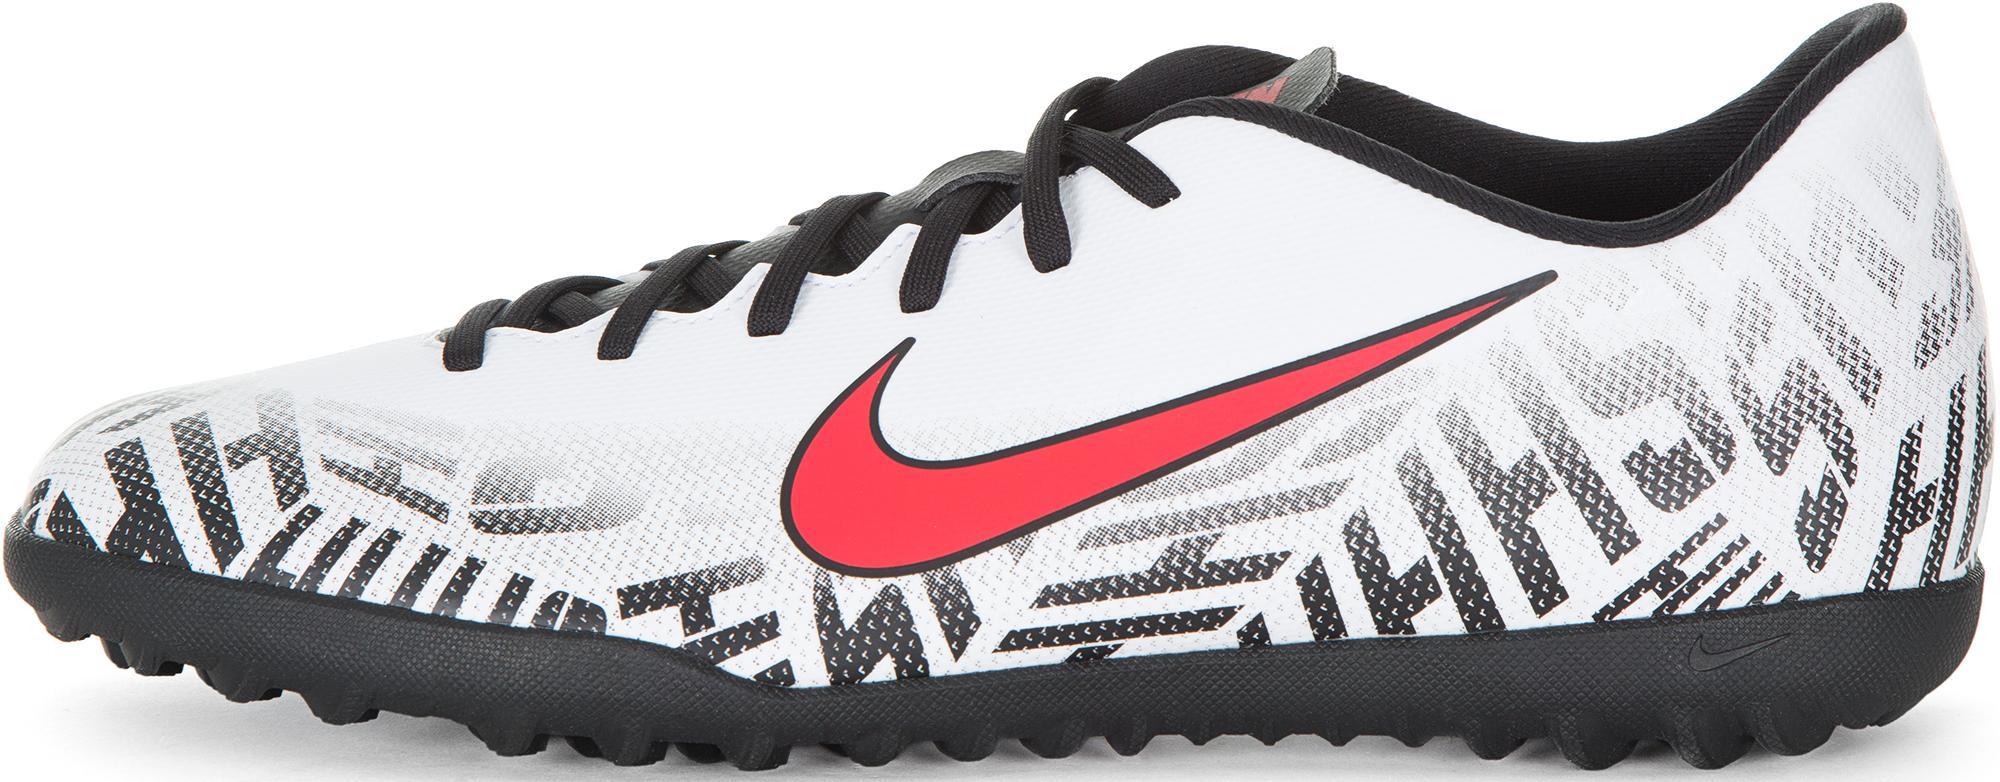 Nike Бутсы мужские Nike Vapor 12 Club Njr TF, размер 45